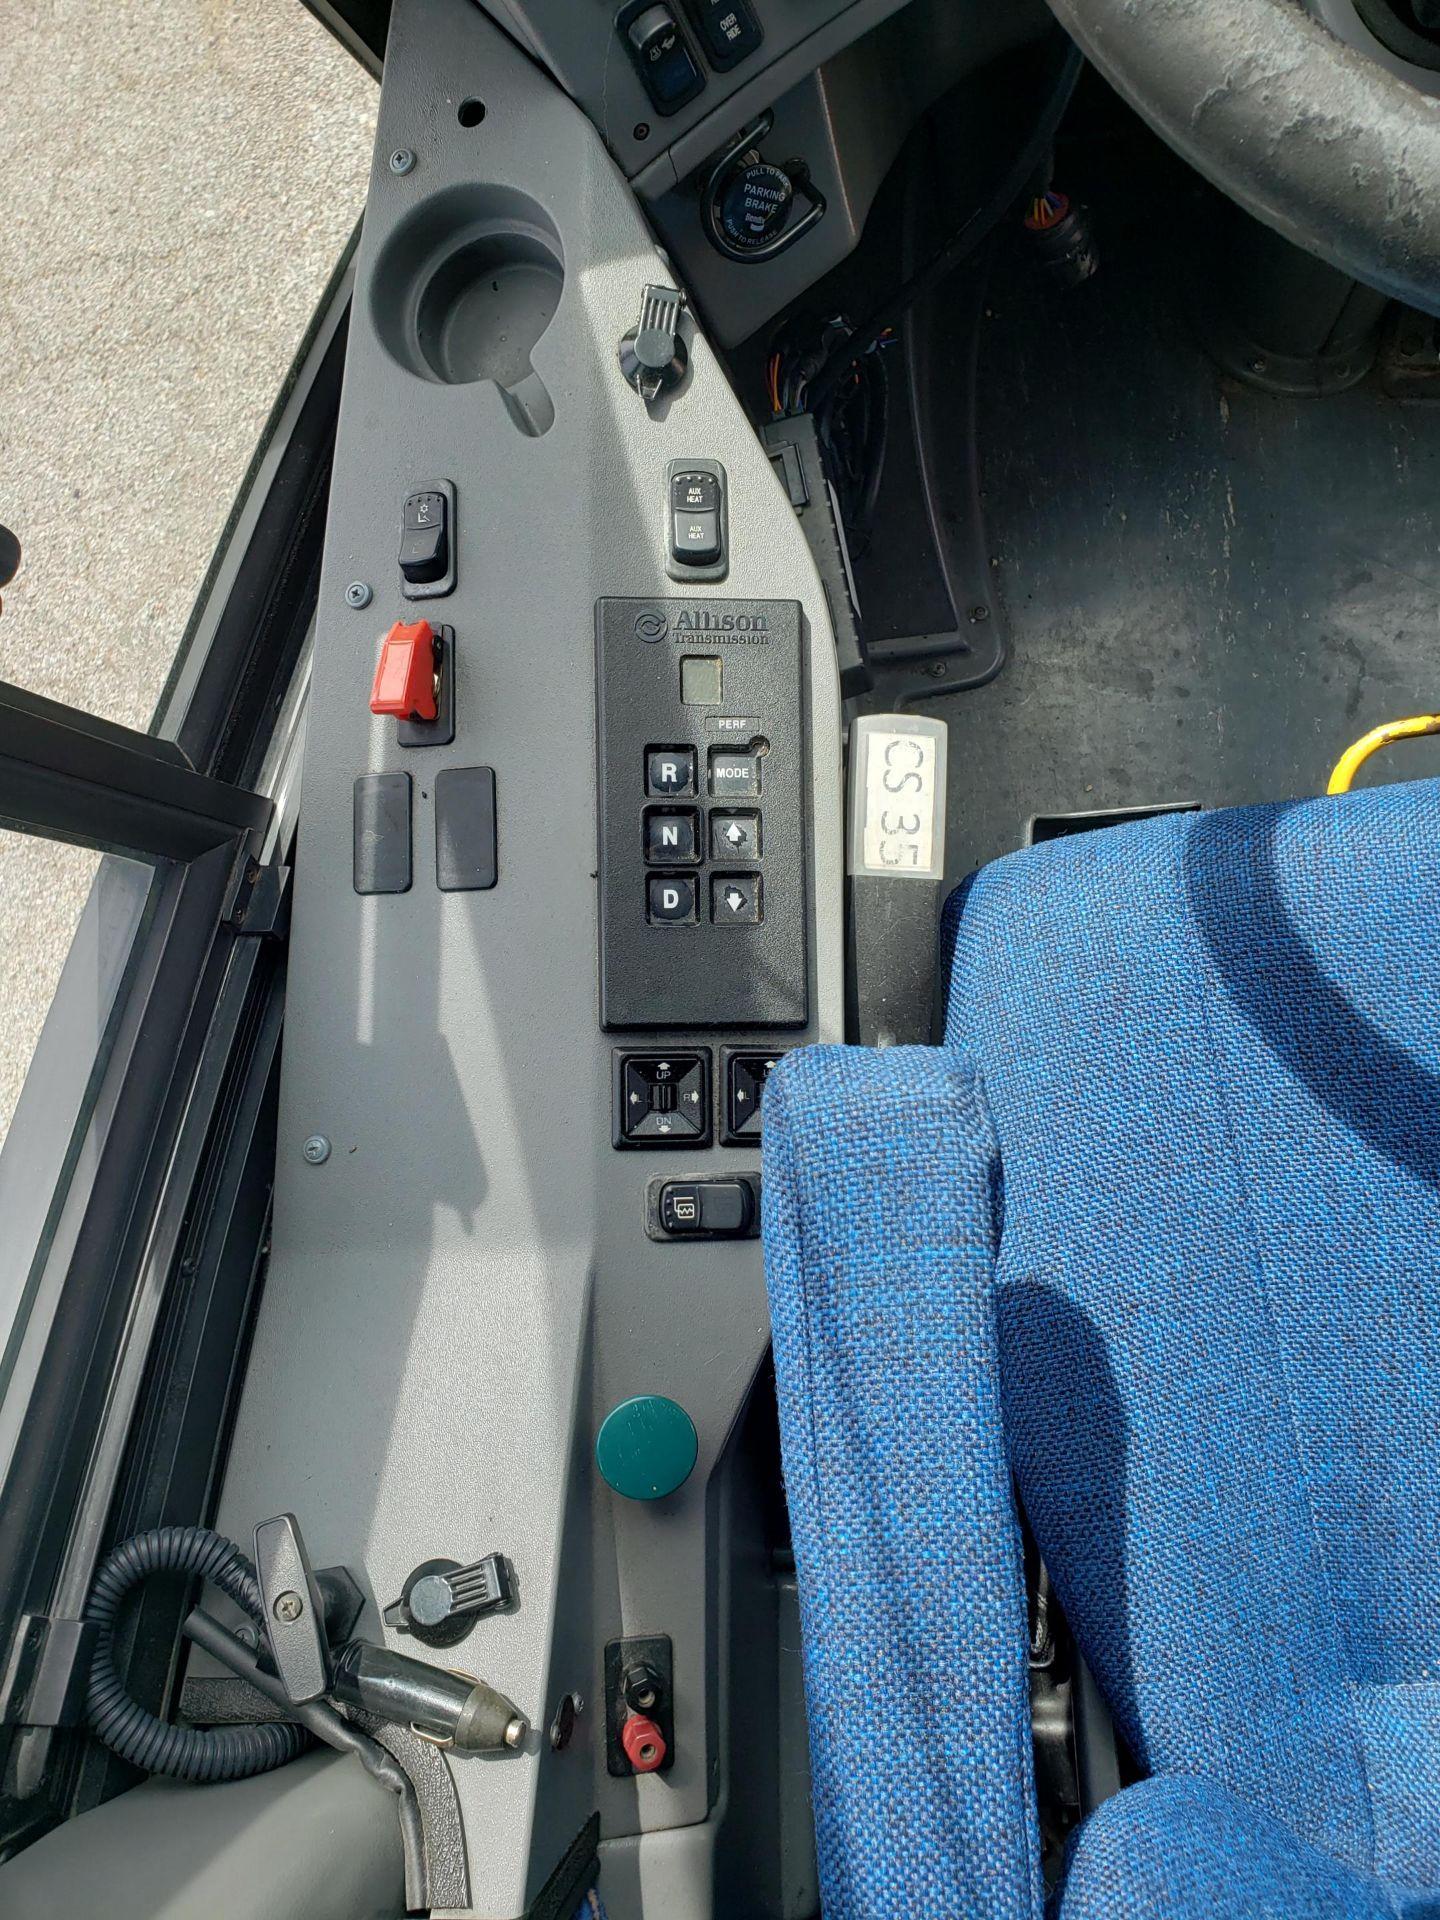 2005 MCI J4500 56-Pass Kneeling Coach Bus - Image 8 of 18